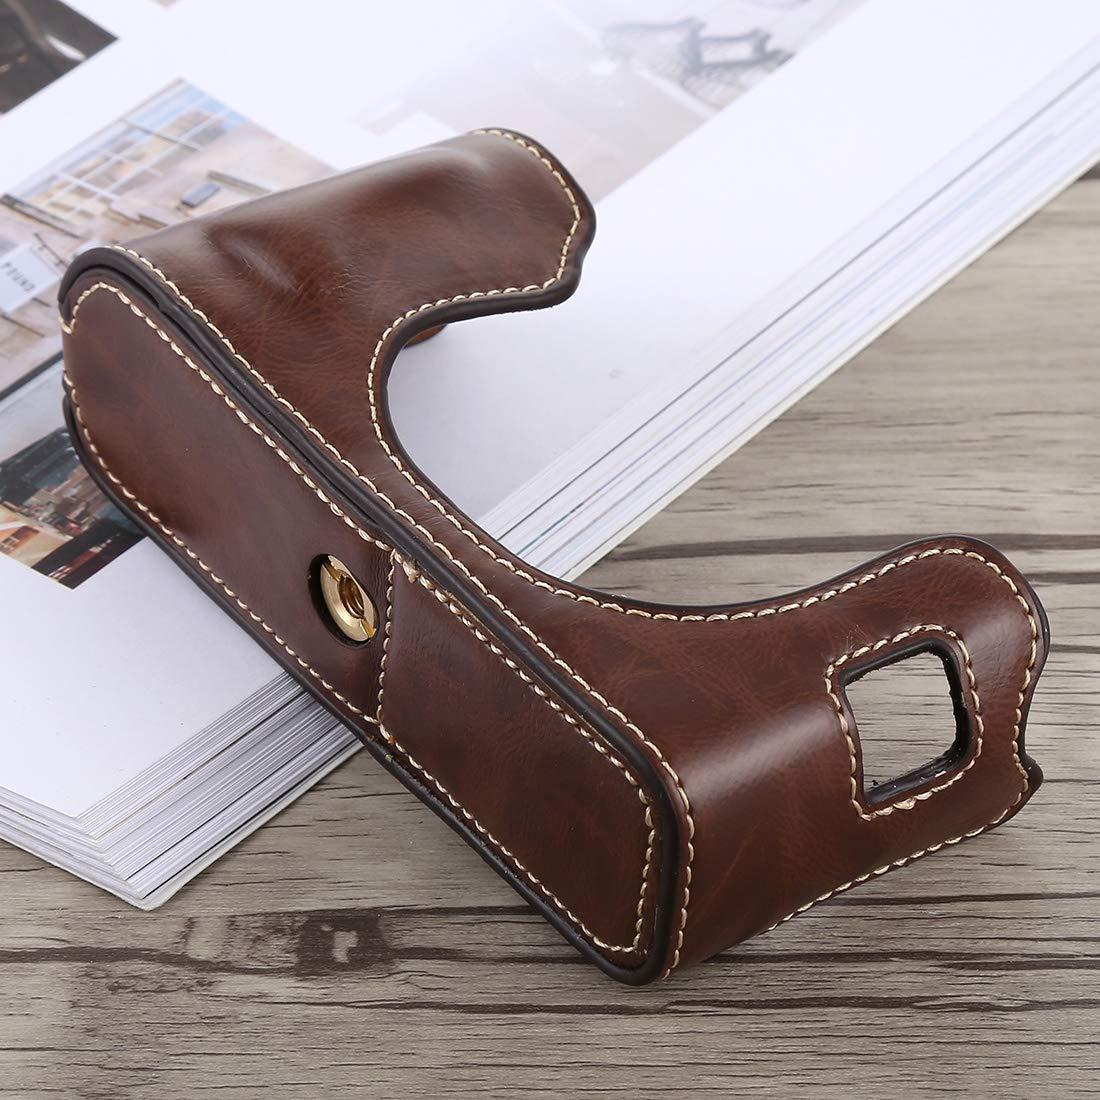 Black Color : Brown Camera Bags Cases 1//4 inch Thread PU Leather Camera Half Case Base for FUJIFILM X100F